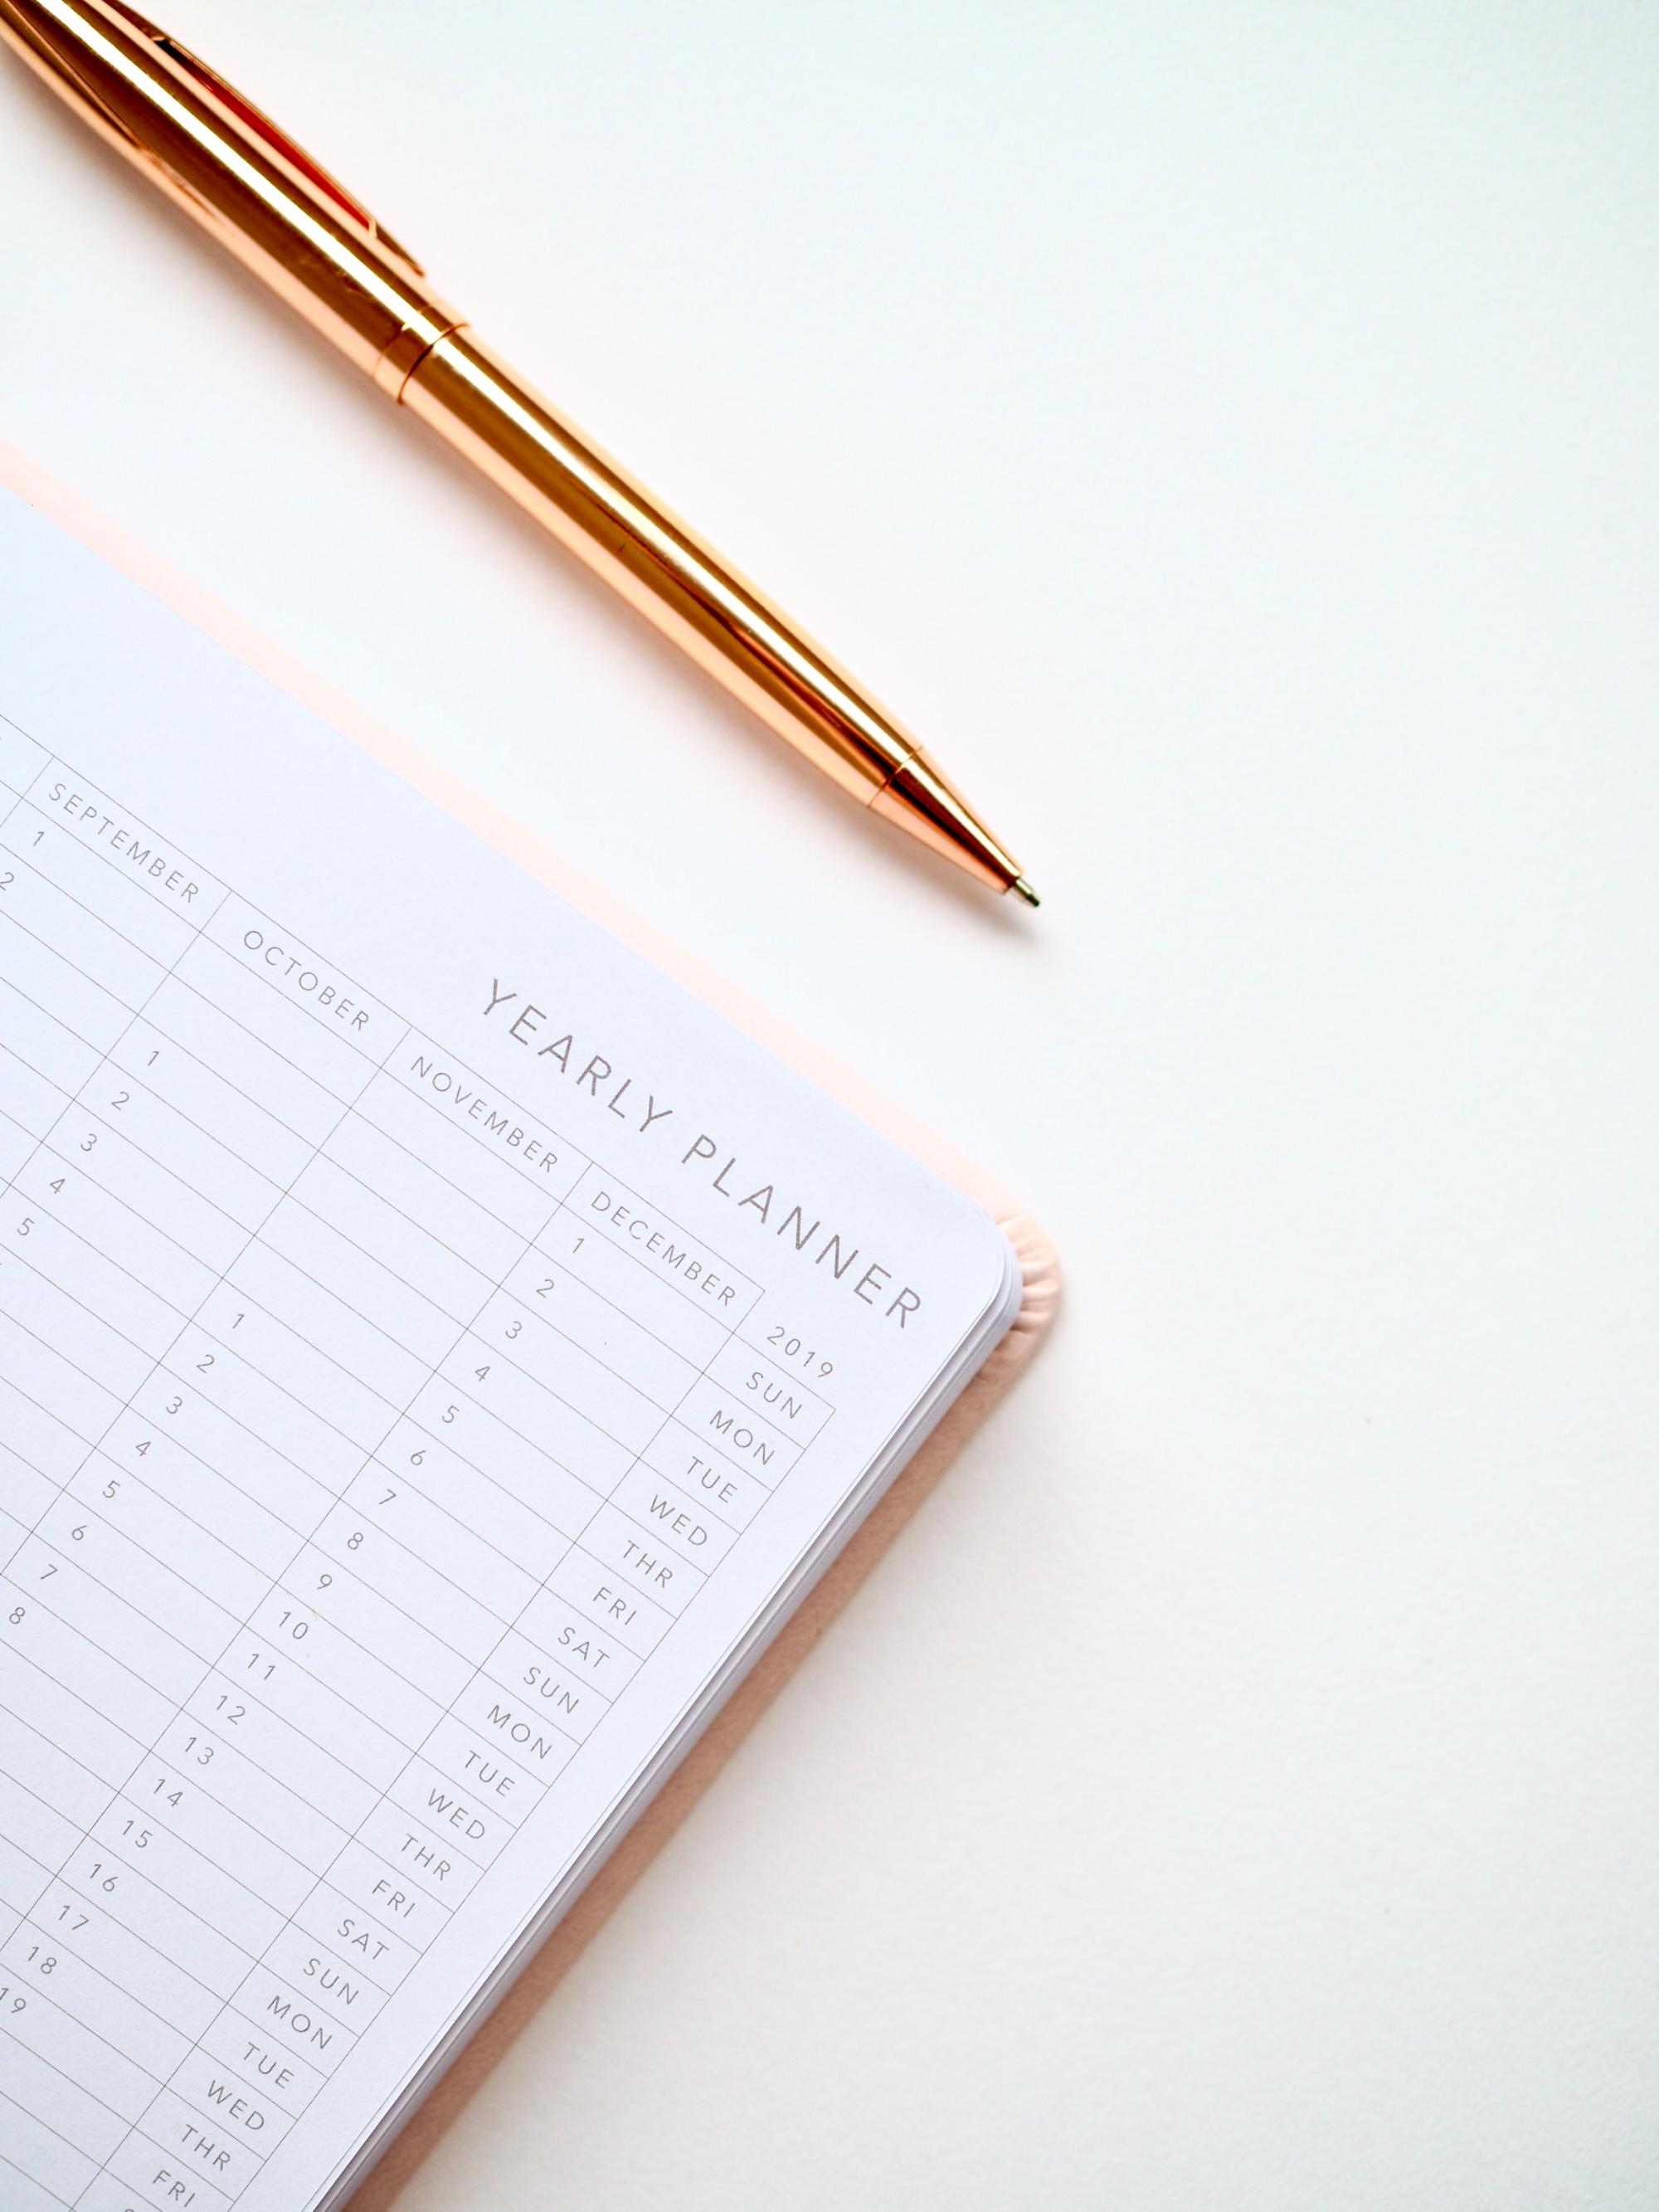 barwon financial planning budgeting (1).jpg